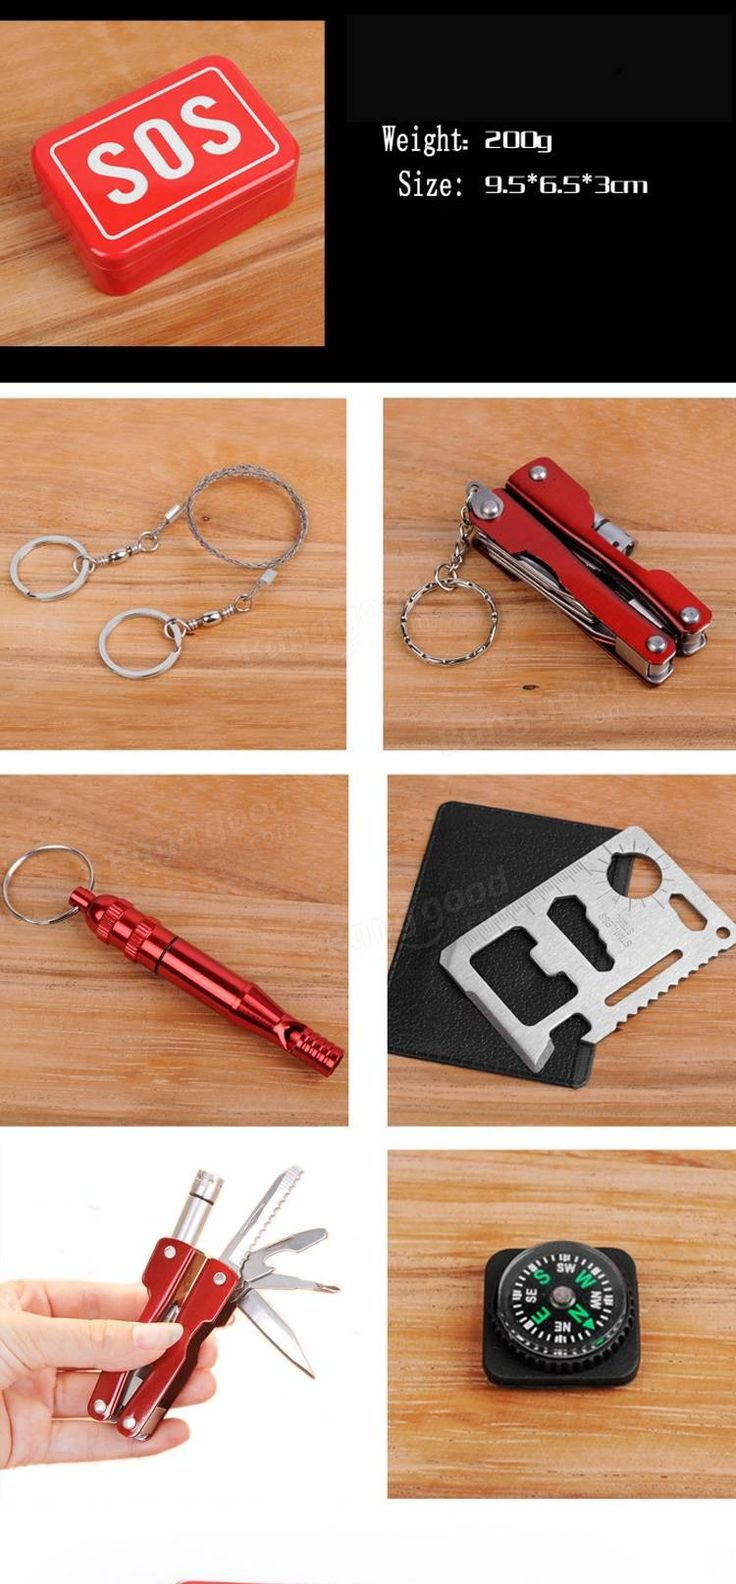 SOS Emergency Equipment Tool Kit First-aid Box Fishing Supplies Outdoor Survival Gear Sale - Banggood.com